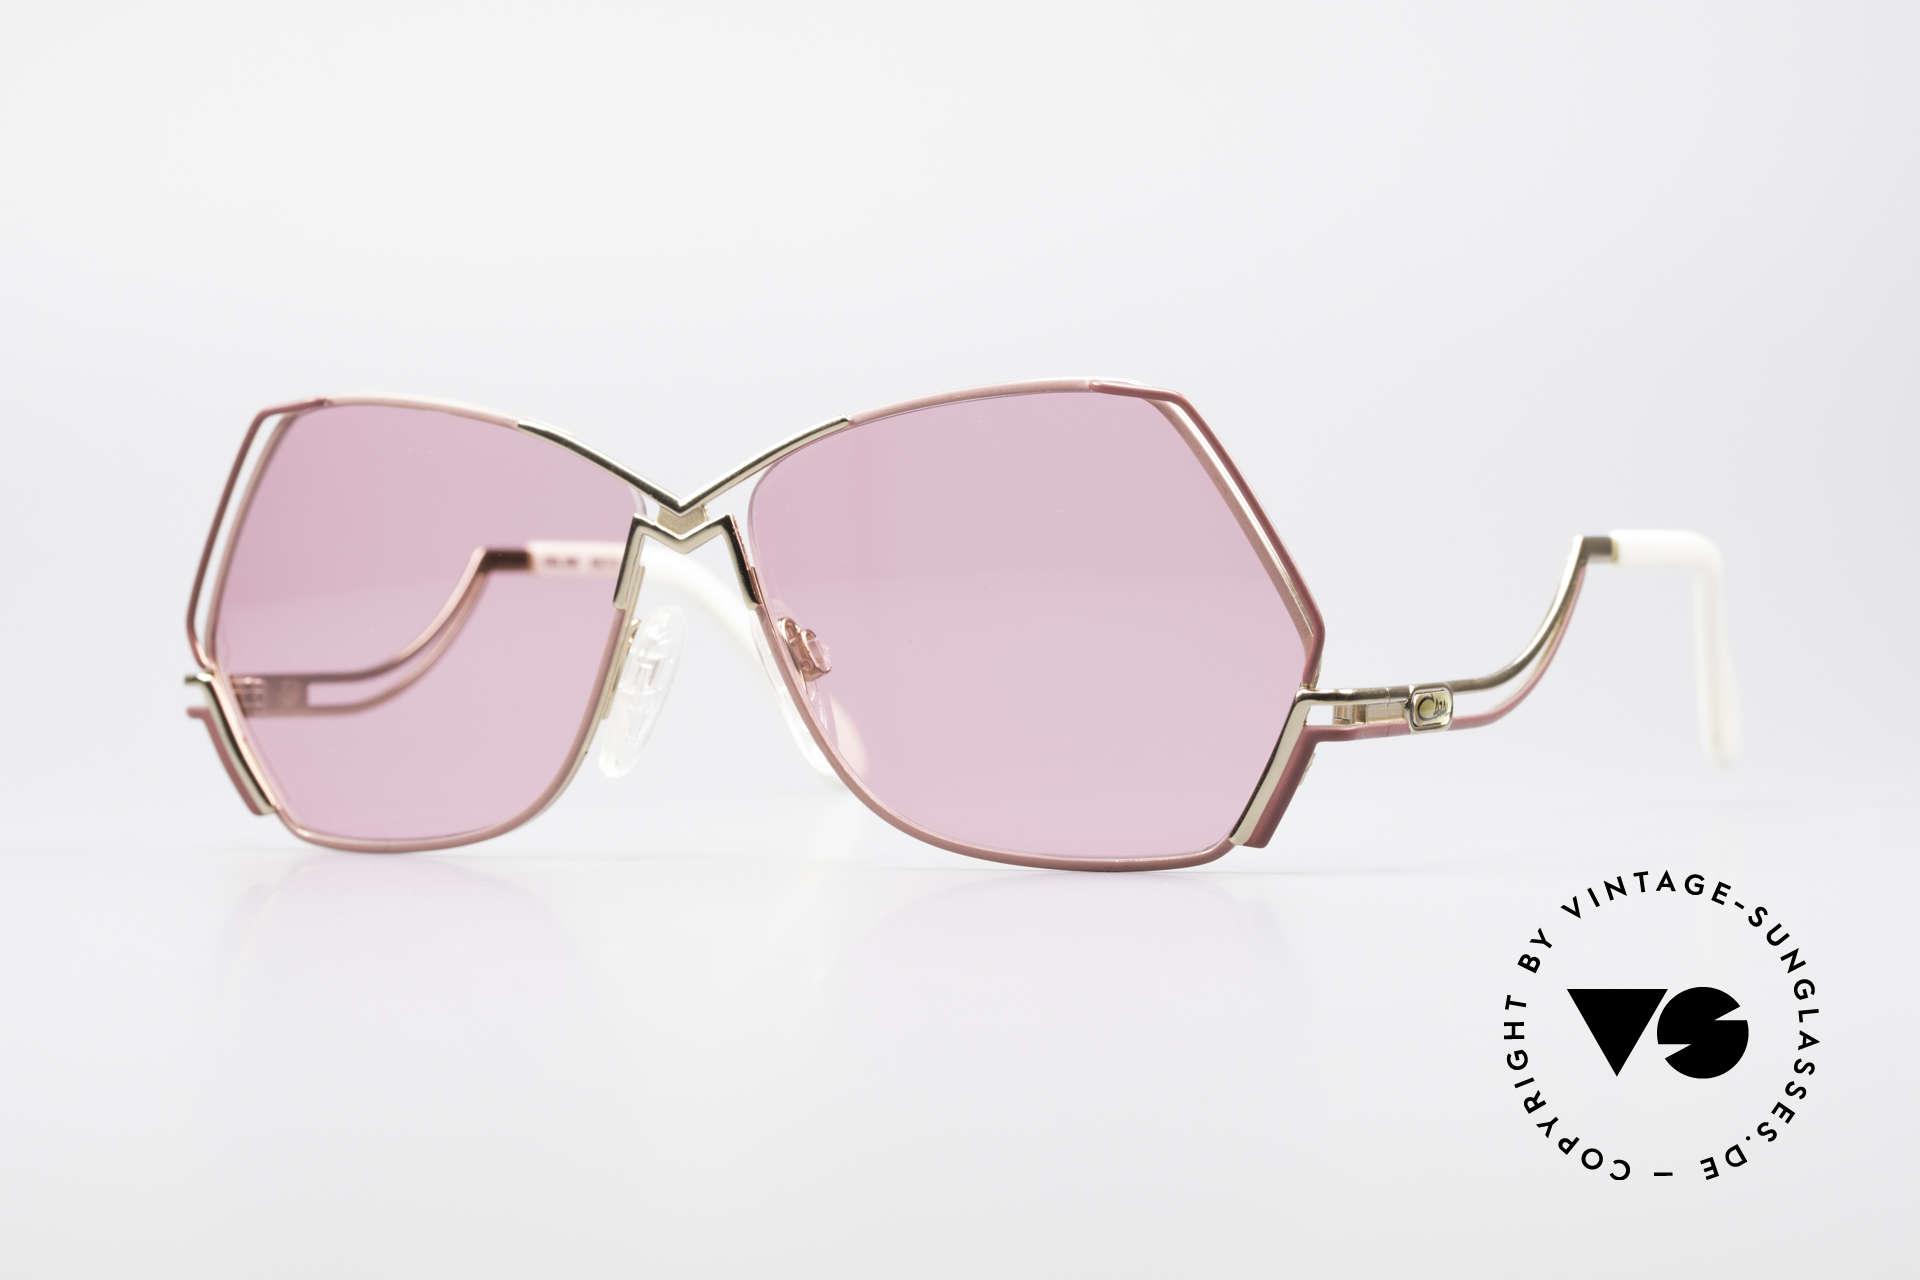 Cazal 226 Pink Vintage Ladies Sunglasses, extraordinary CAZAL sunglasses with pentagonal lens, Made for Women